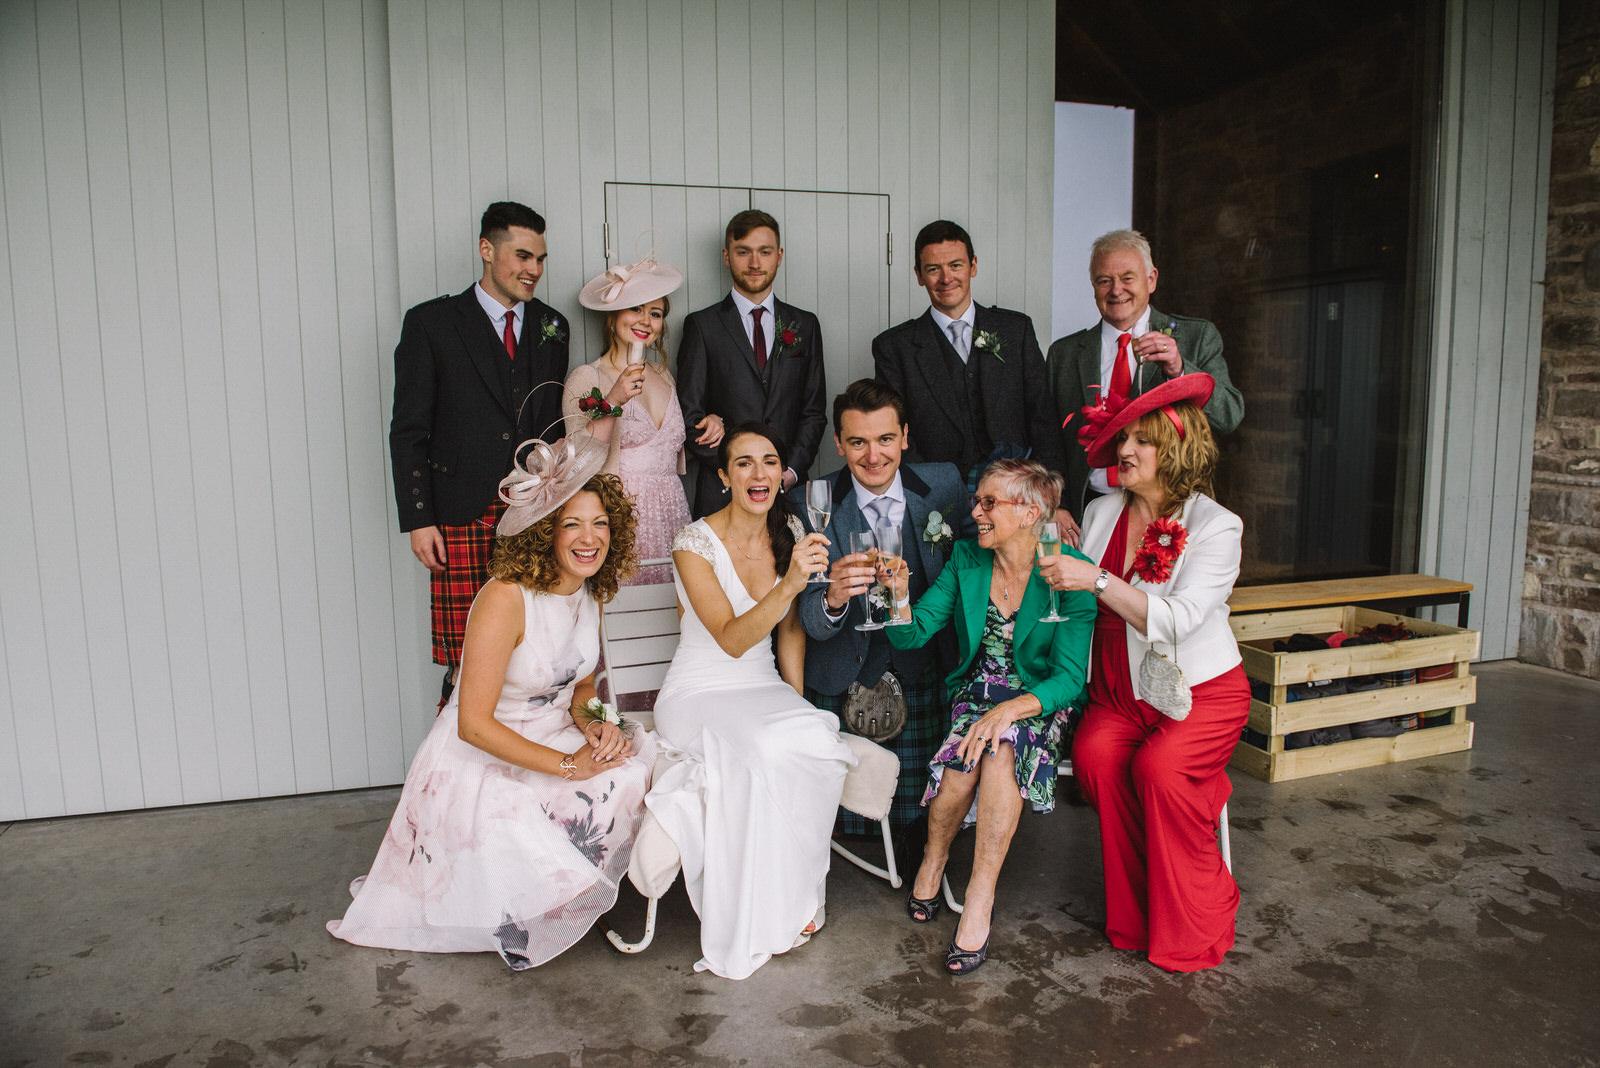 035-GUARDSWELL-FARM-WEDDING-ALTERNATIVE-SCOTTISH-WEDDING-PHOTOGRAPHER-SCOTTISH-WEDDING-DESTINATION-WEDDING-PHOTOGRAPHER.JPG